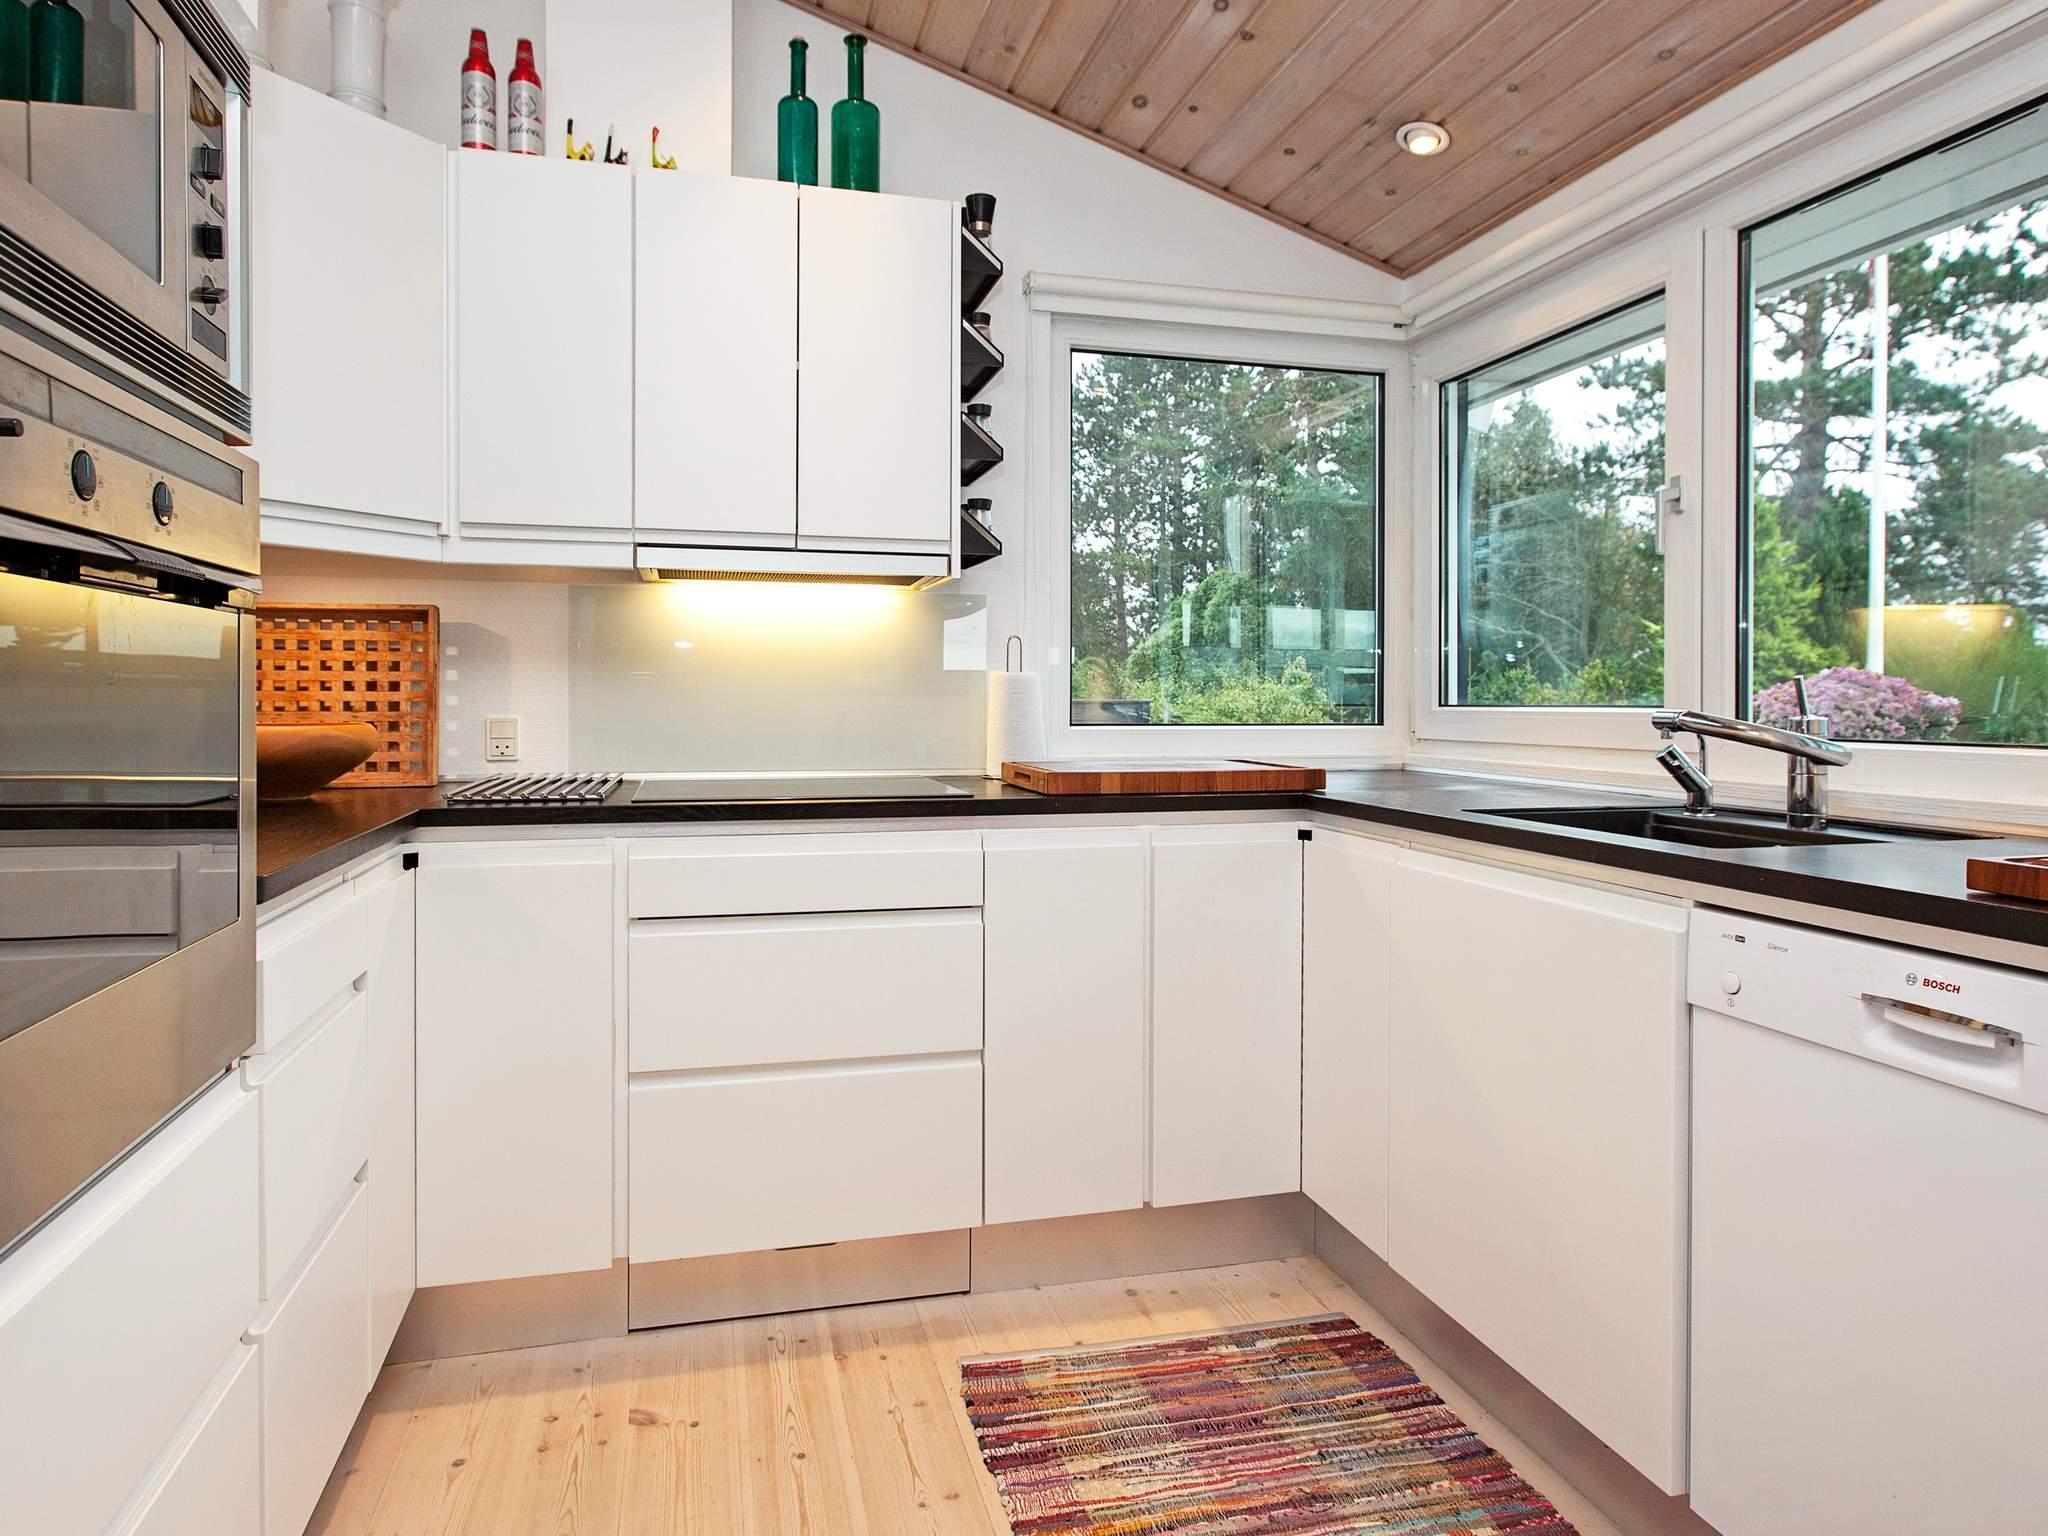 Ferienhaus Lyngsbæk Strand (456410), Ebeltoft, , Ostjütland, Dänemark, Bild 9